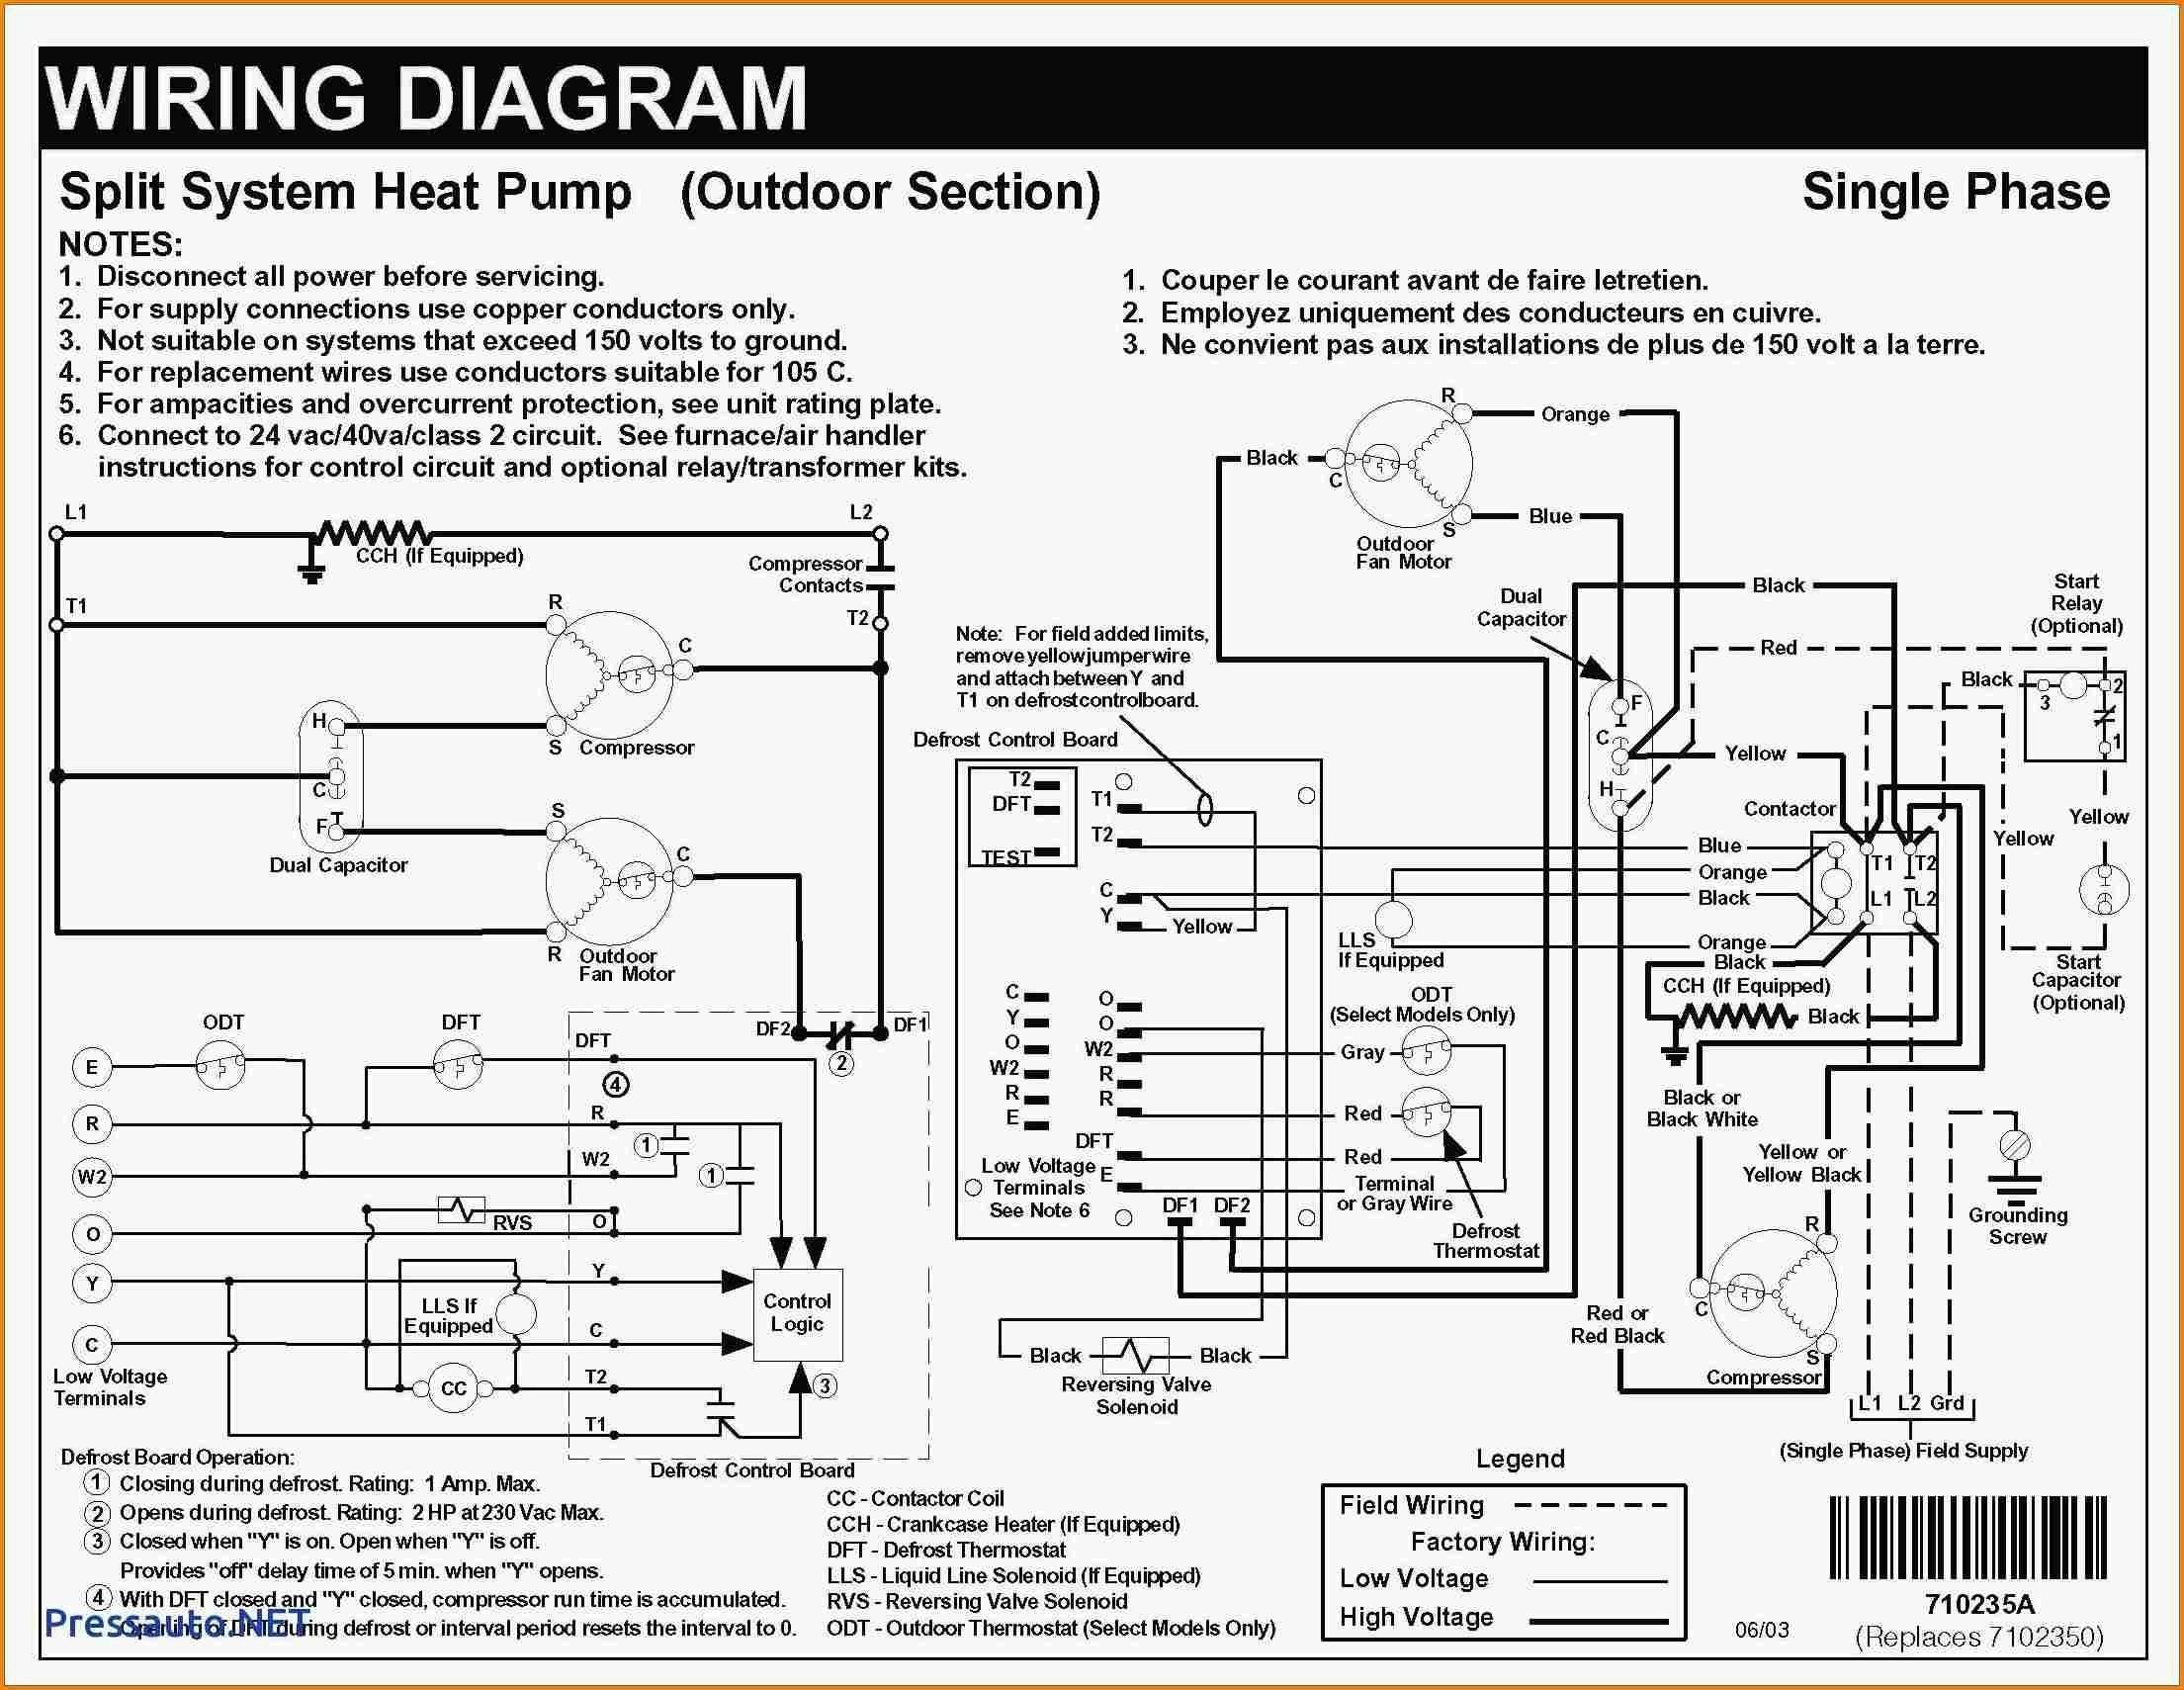 Electric Furnace Wiring Diagram Furnace Wiring Diagram Unique Best Wiring Diagram Od Rv Park Of Electric Furnace Wiring Diagram